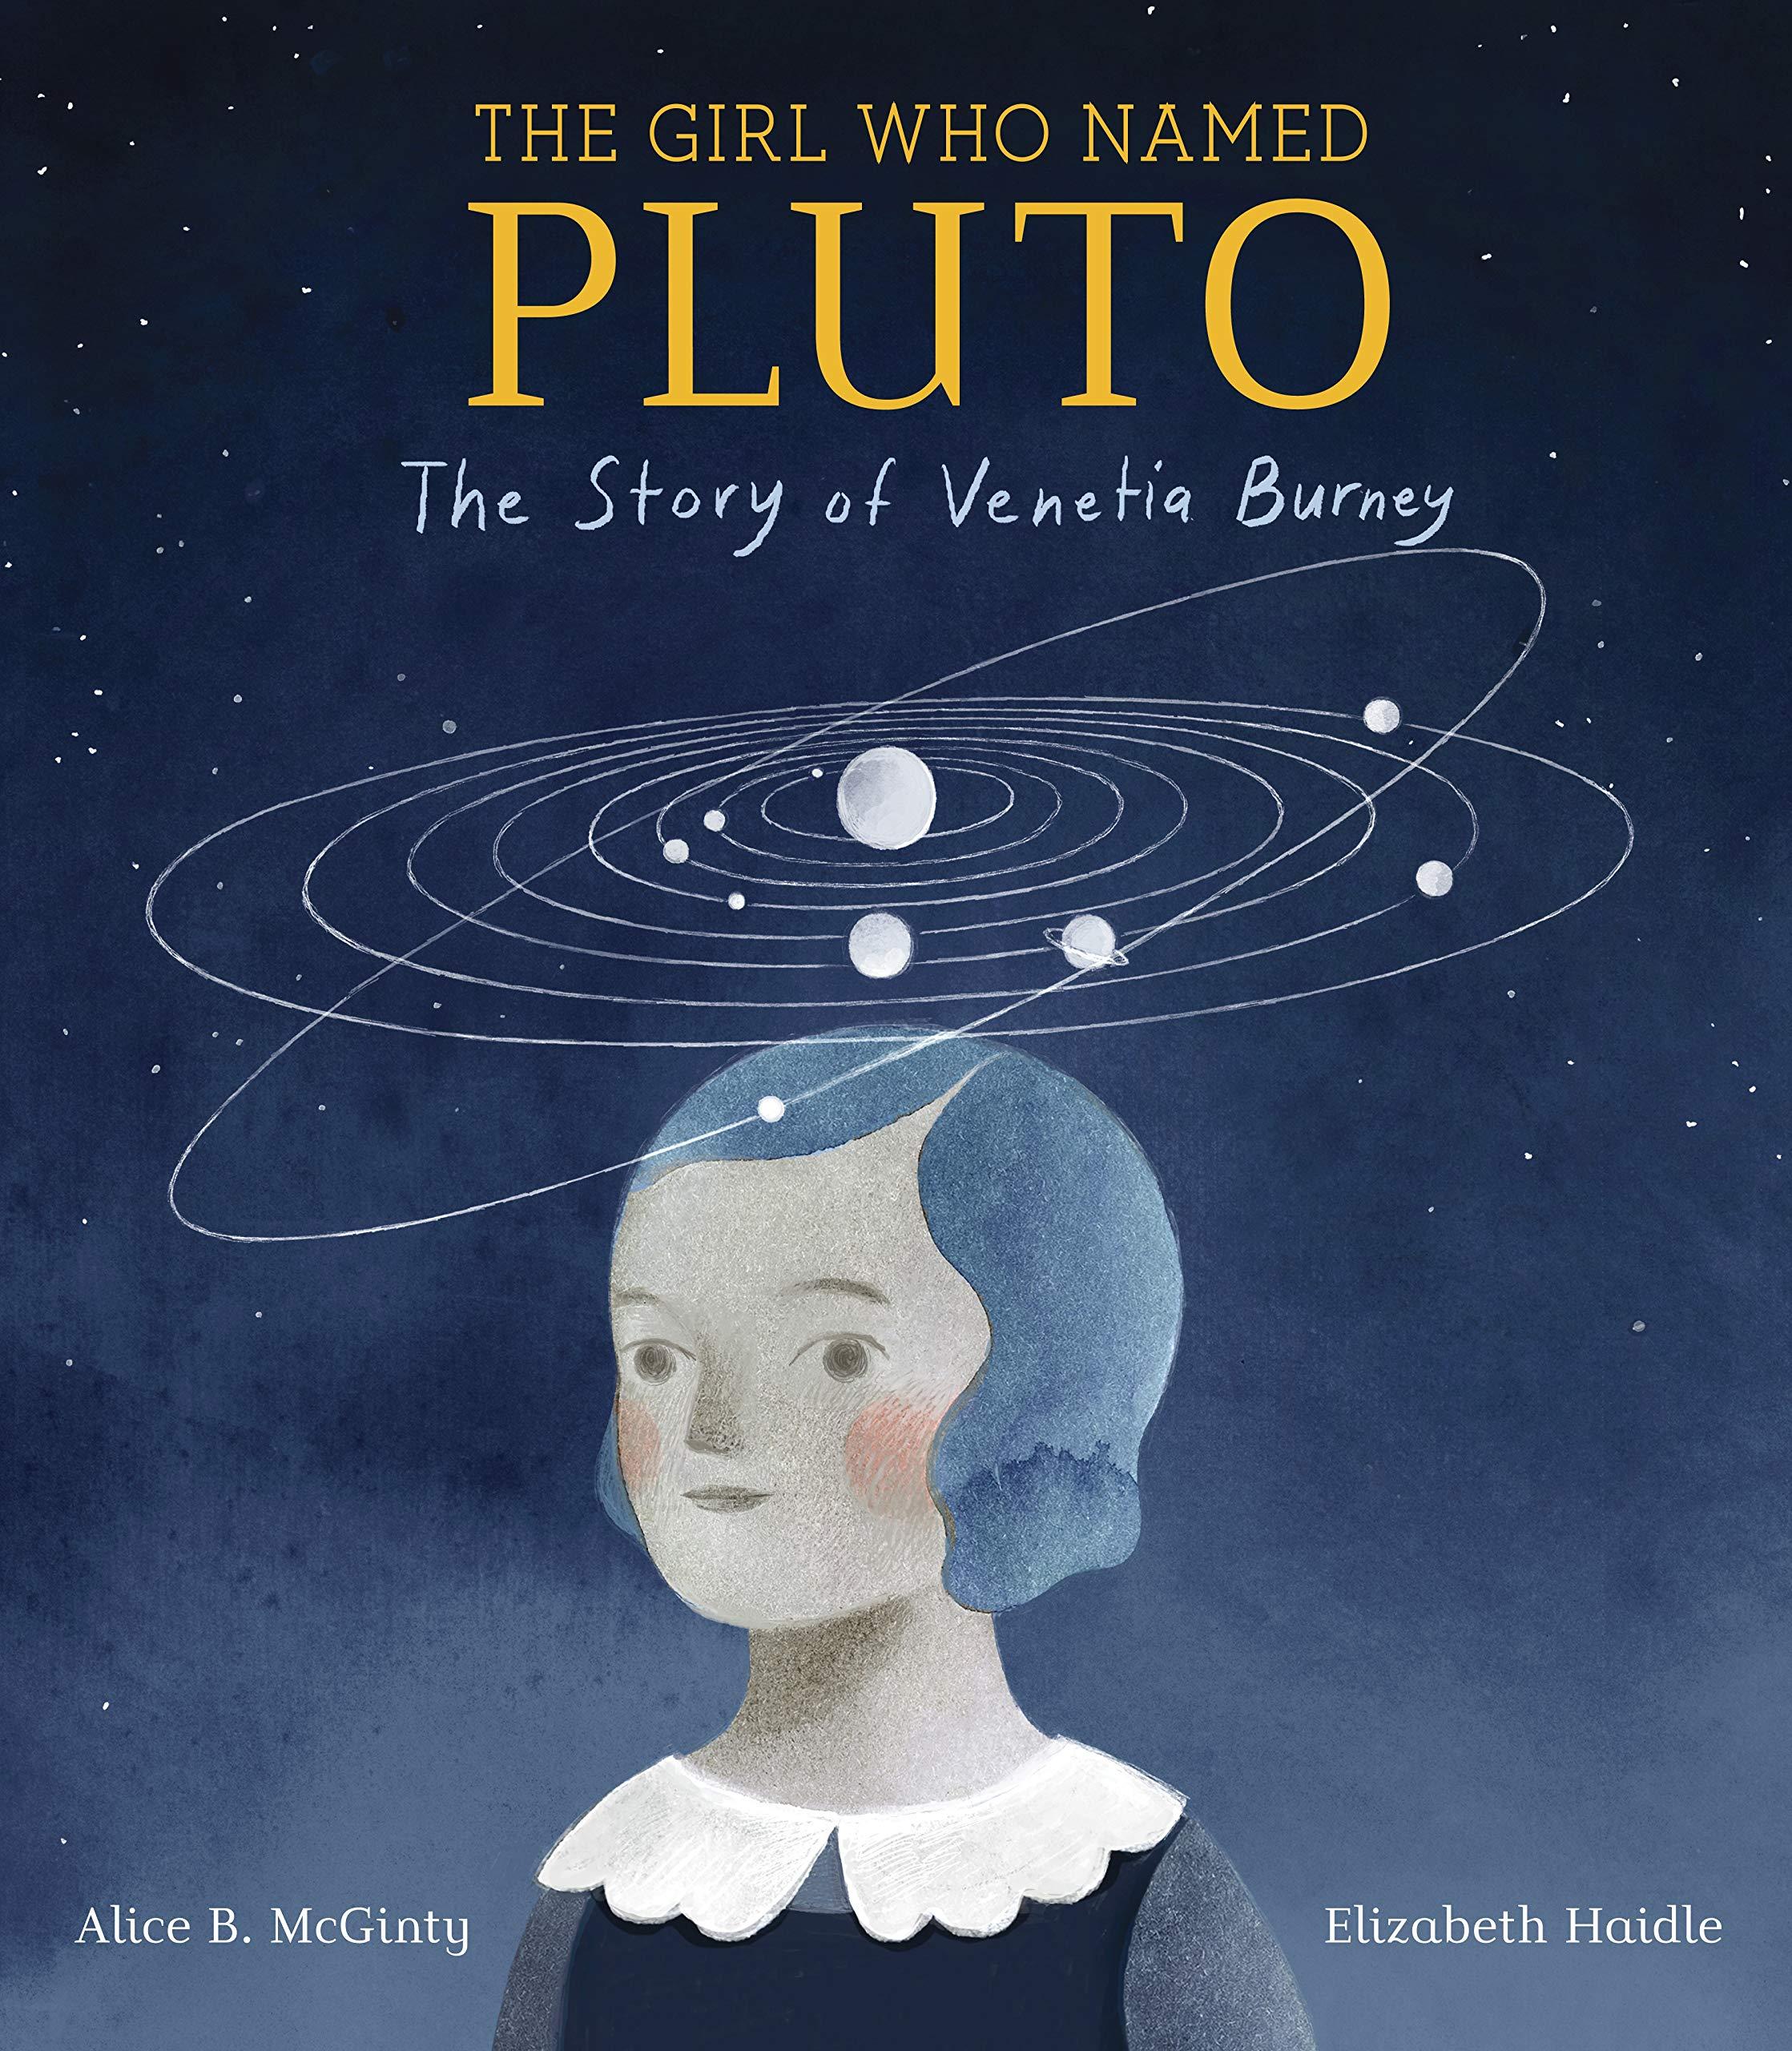 The Girl Who Named Pluto: The Story of Venetia Burney: McGinty, Alice B.,  Haidle, Elizabeth: 9781524768317: Amazon.com: Books